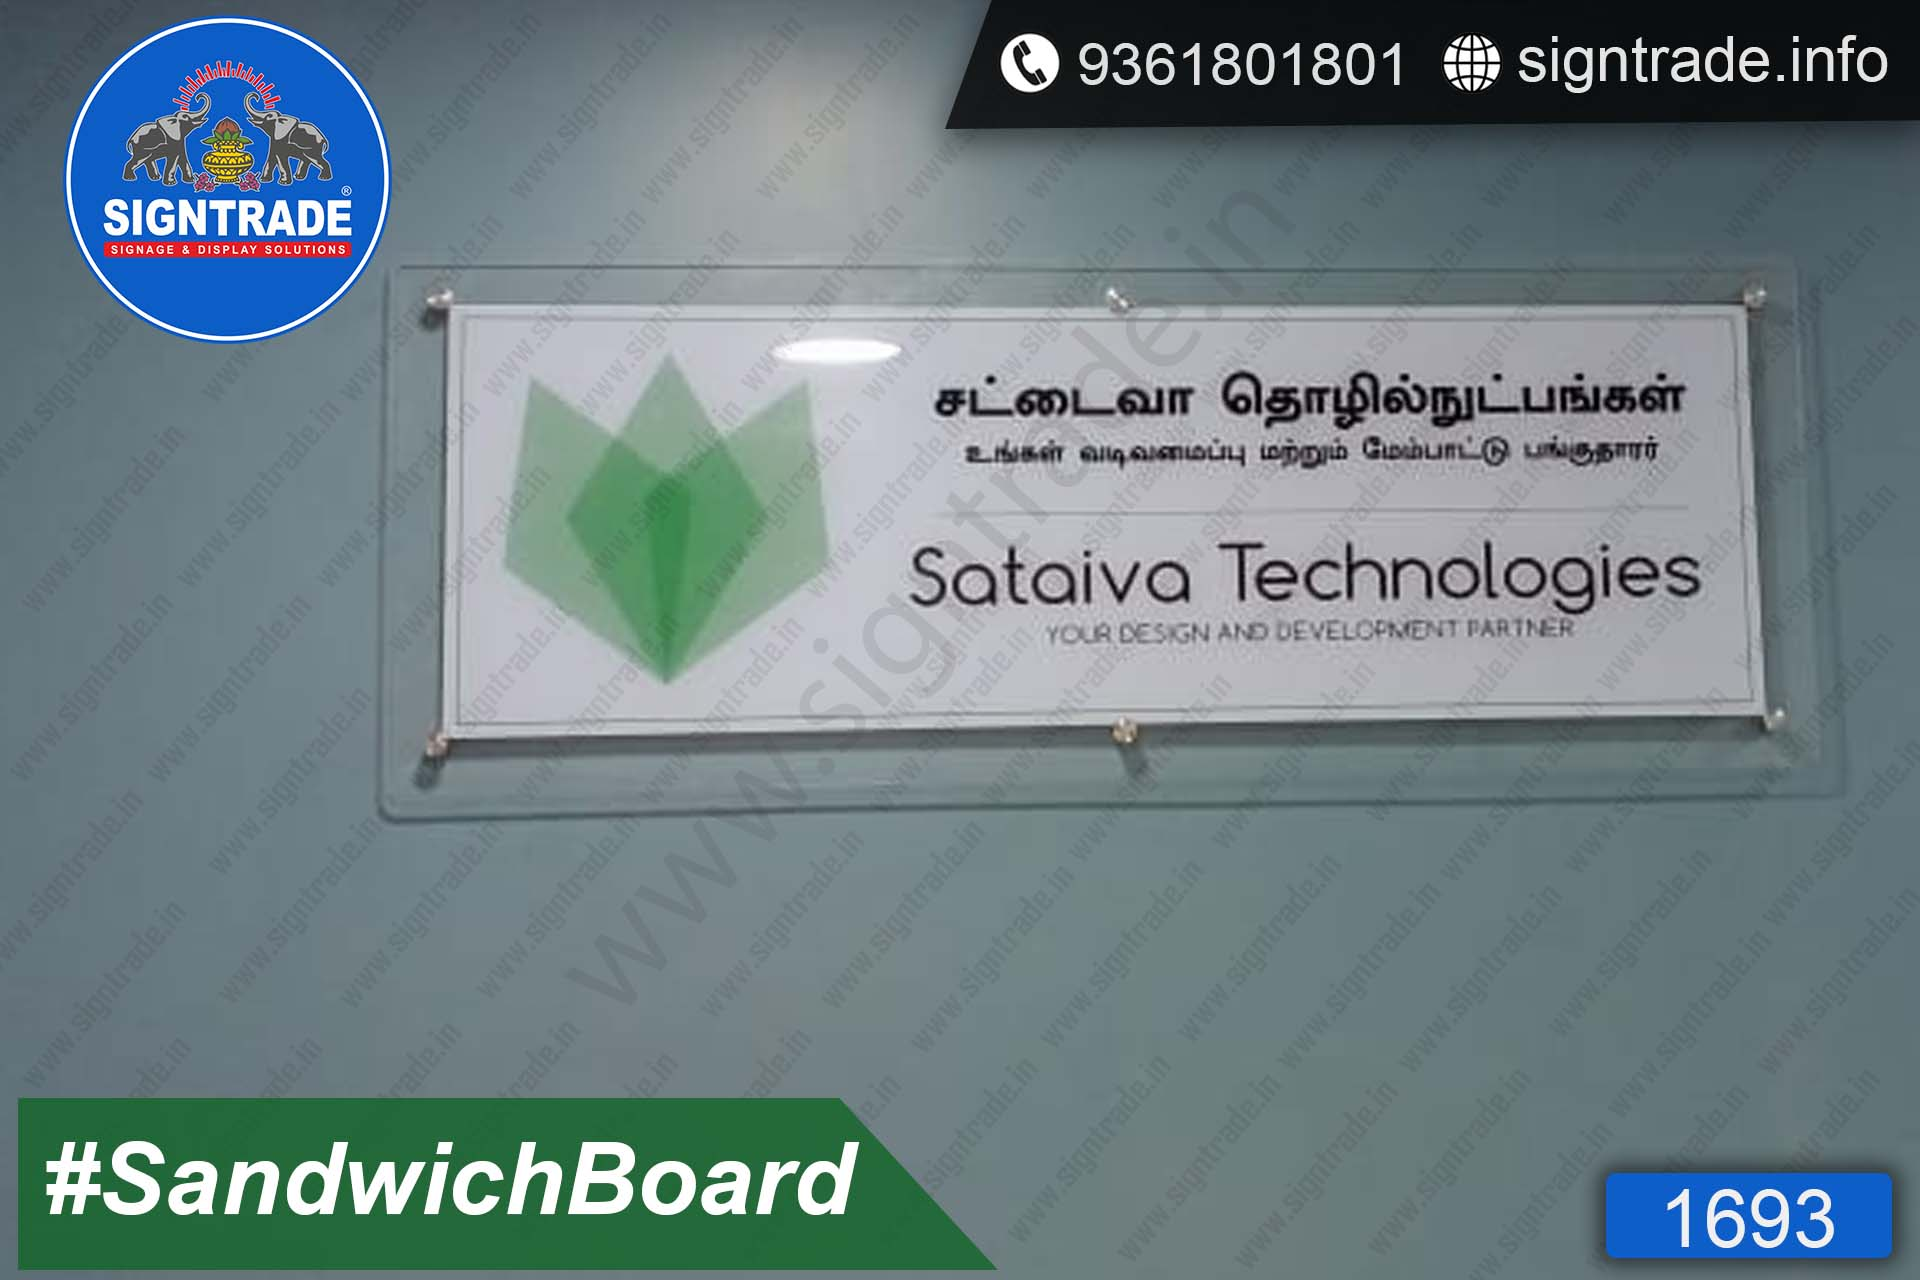 Sataiva Technologies, Chennai - SIGNTRADE - Acrylic Sandwich Board Manufacture in Chennai